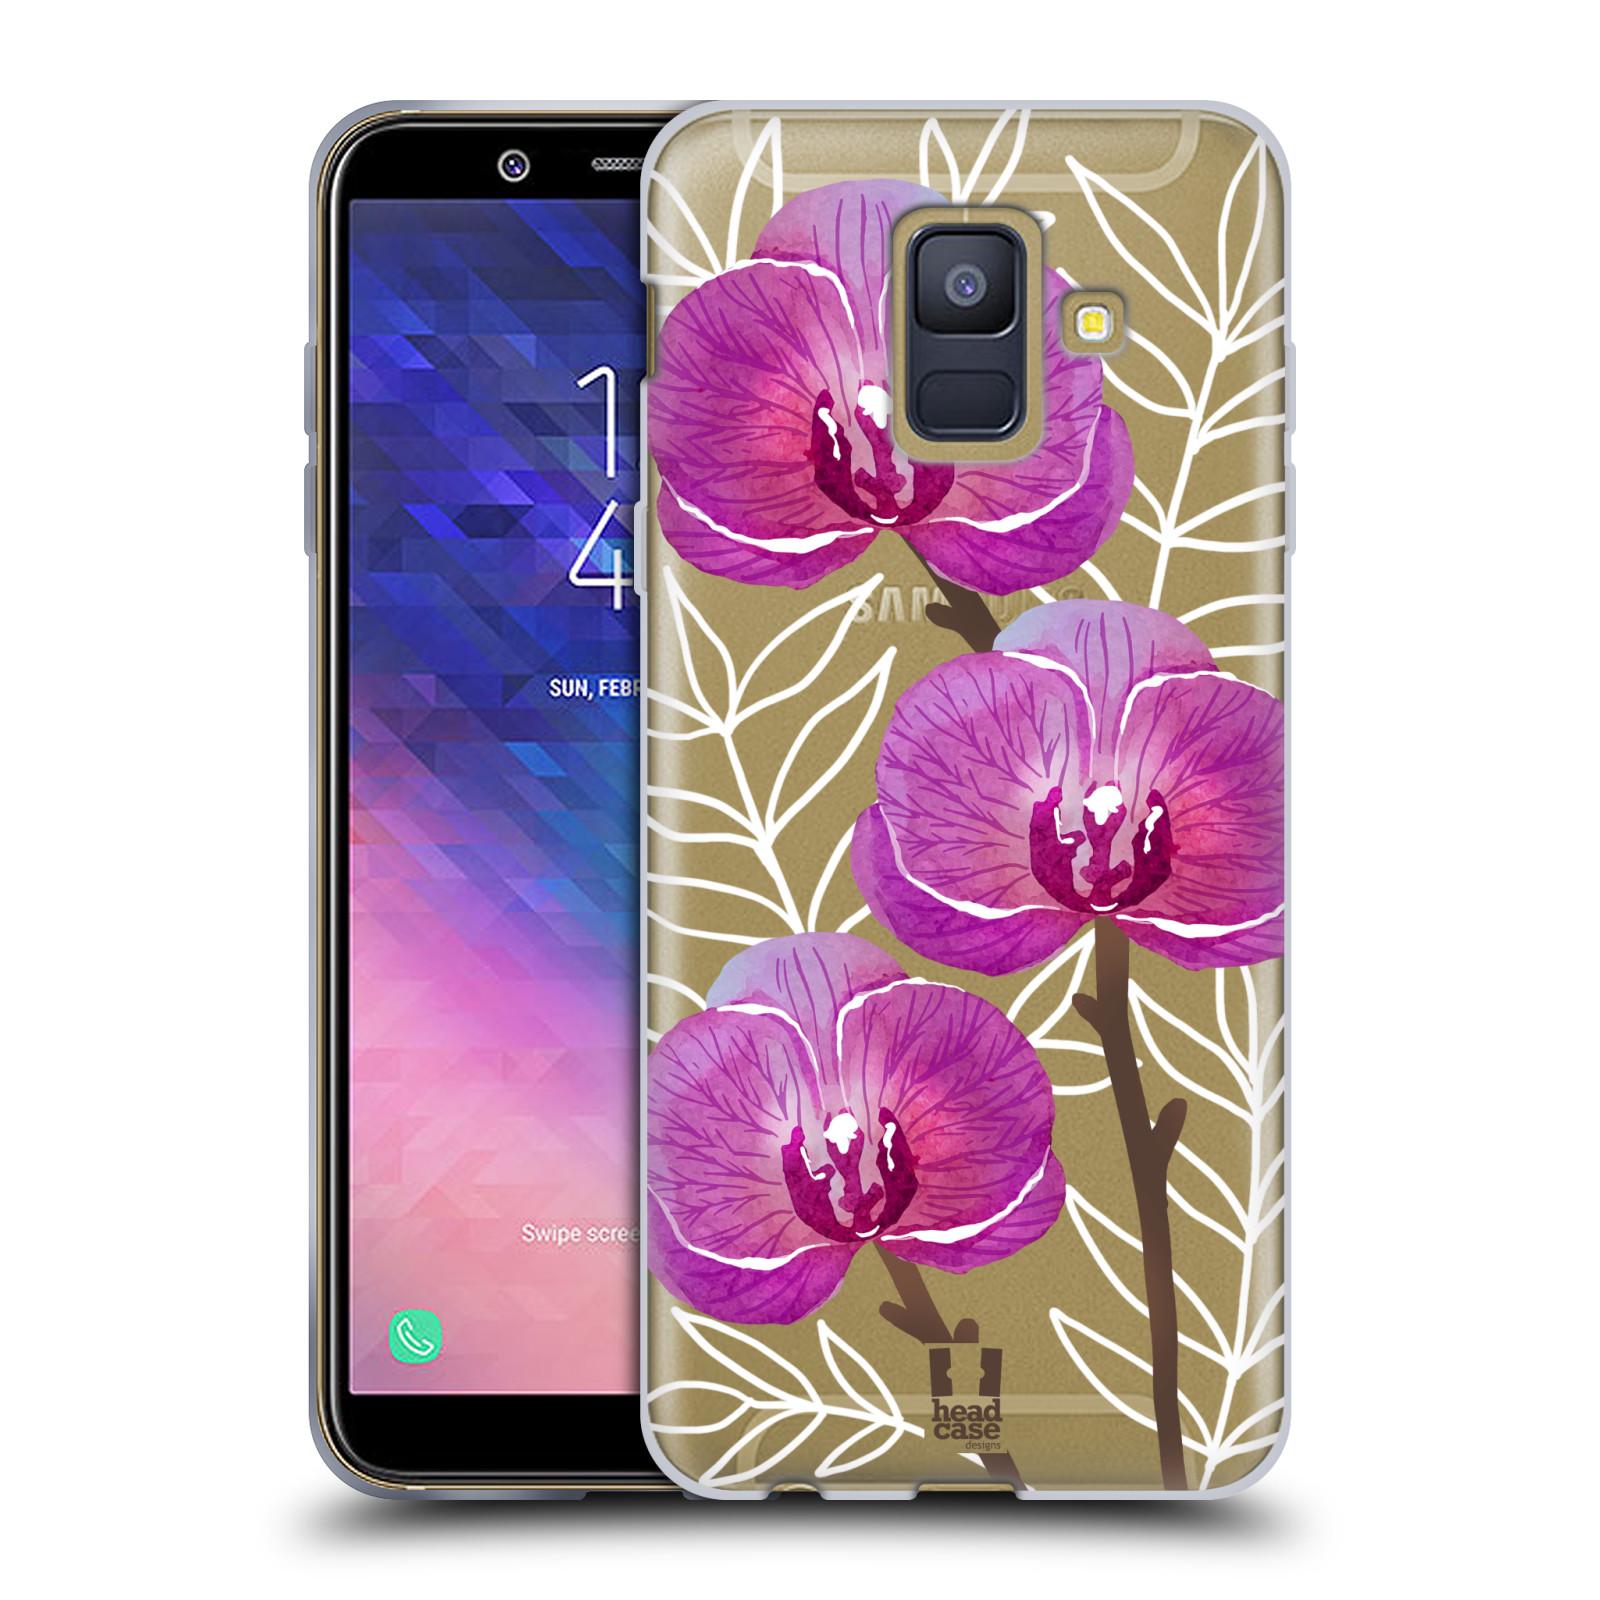 Silikonové pouzdro na mobil Samsung Galaxy A6 (2018) - Head Case - Hezoučké kvítky - průhledné